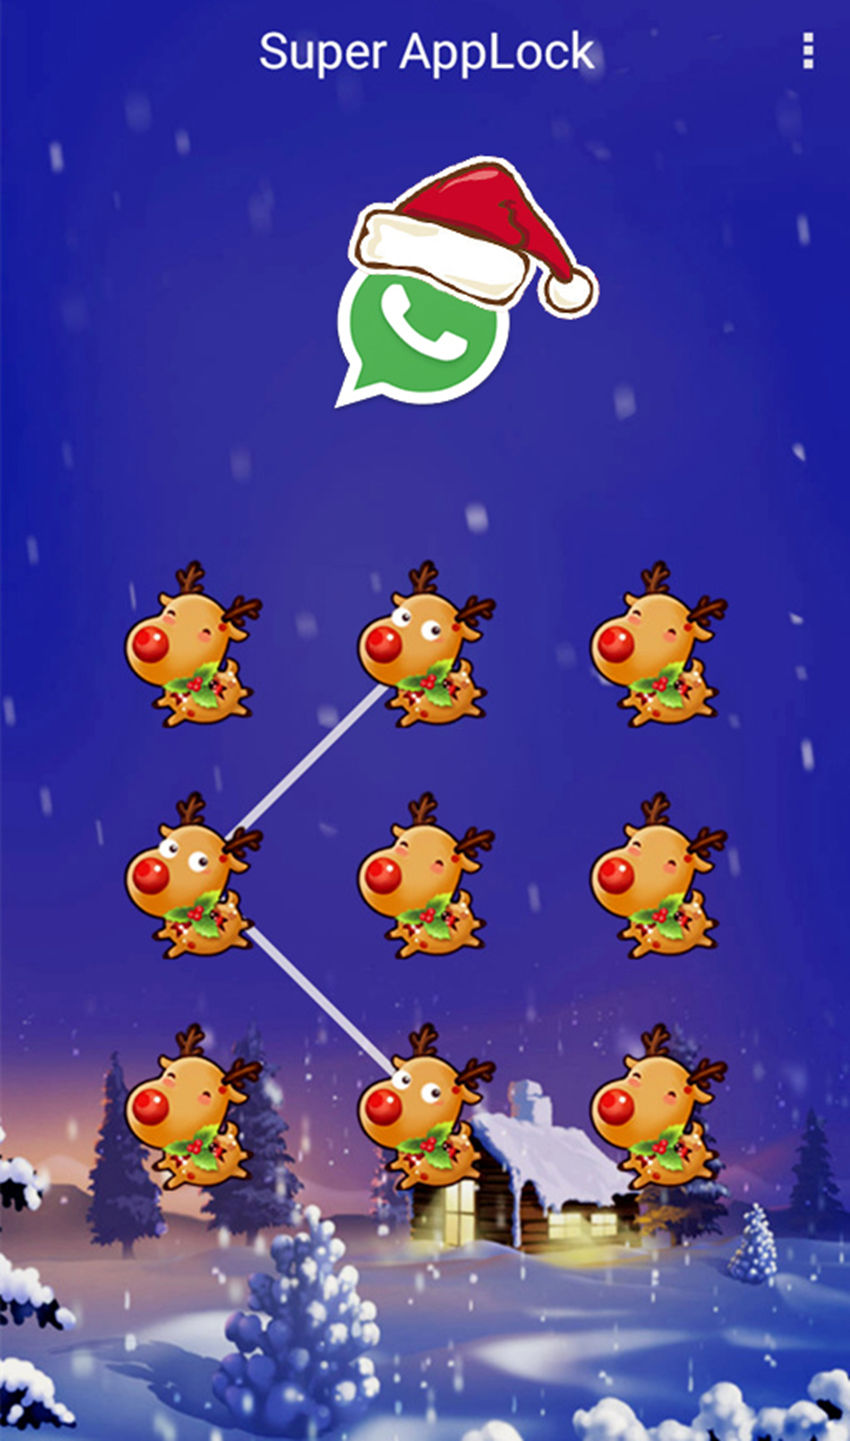 AppLock Theme Christmas Screenshot 2